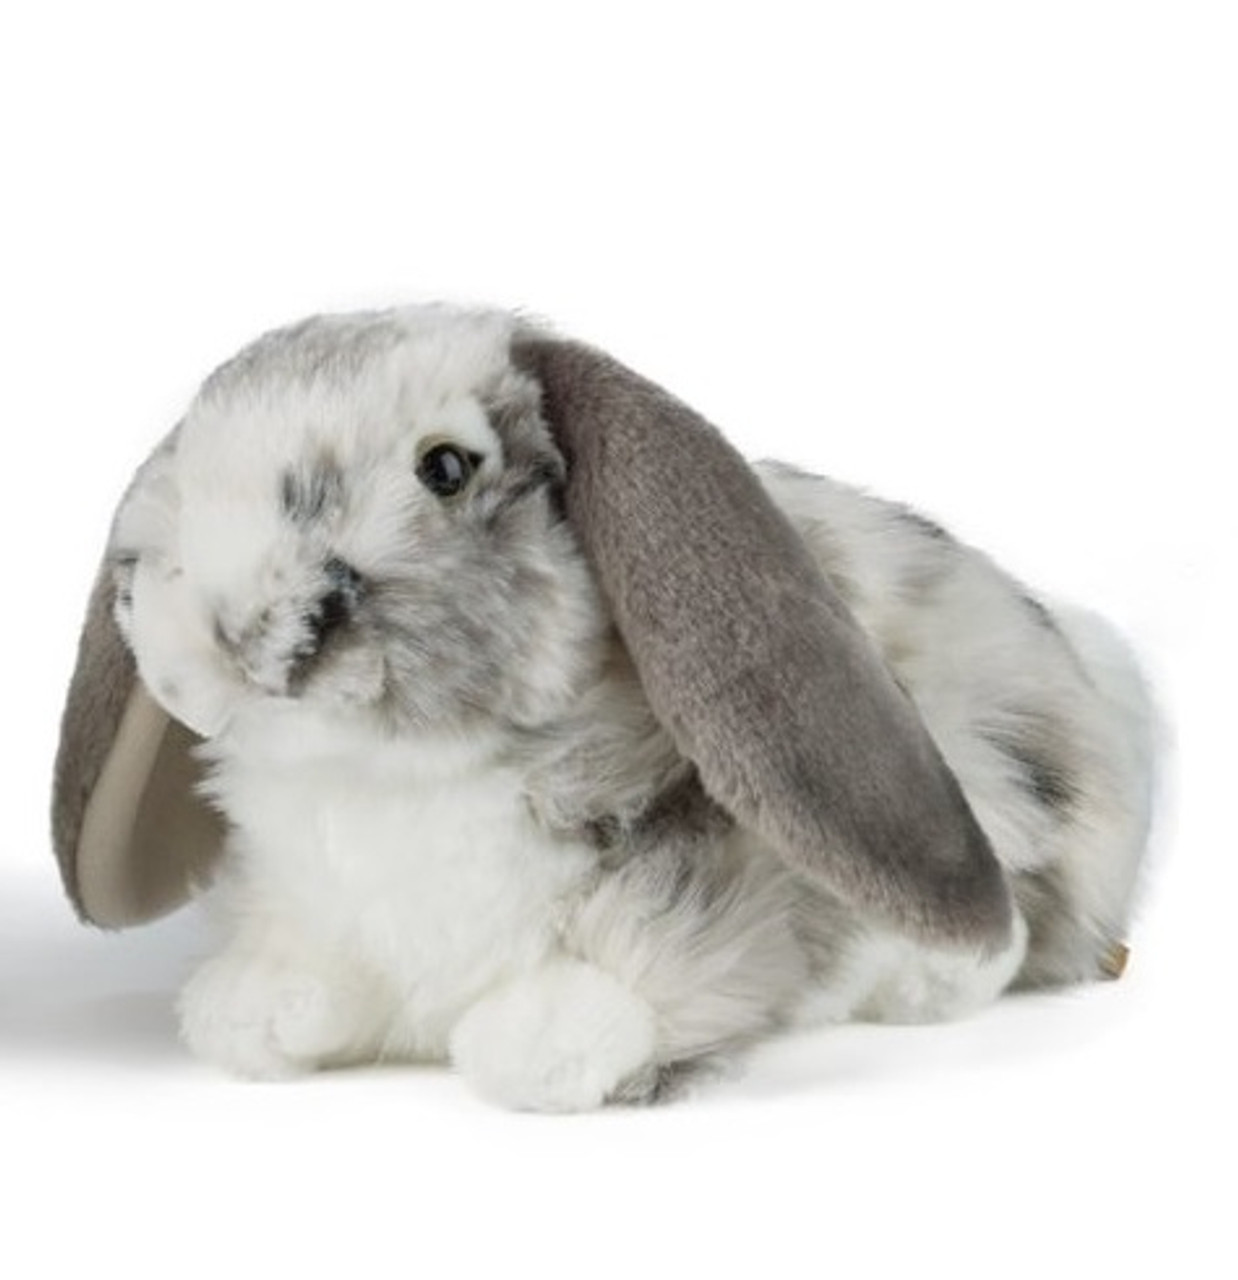 Grey Dutch Lop Eared Rabbit Plush Toy - Living Nature